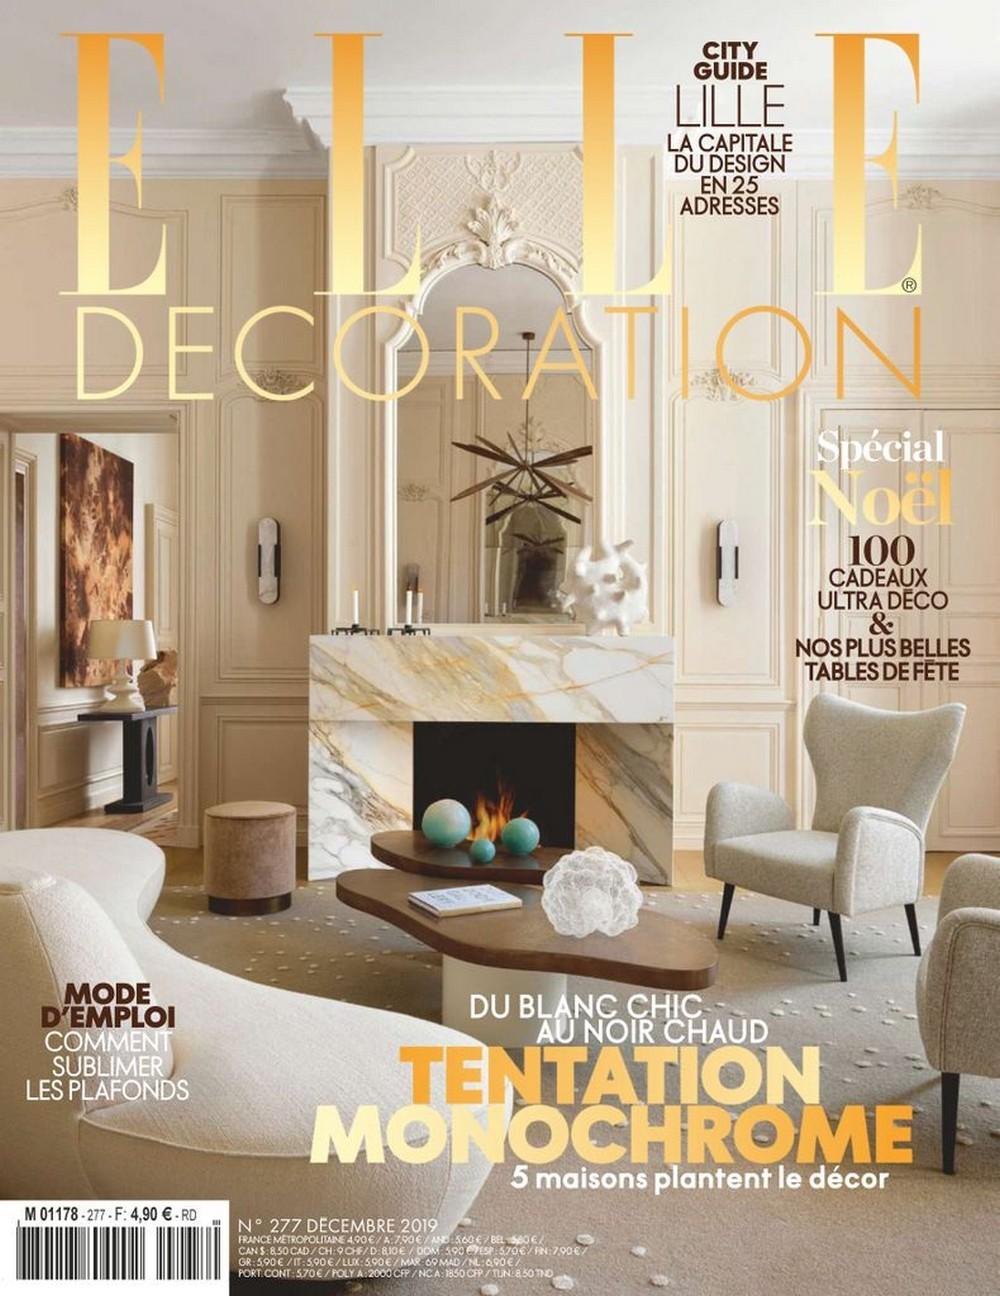 5 Interior Design Magazines You Must Read This Month! interior design 5 Interior Design Magazines You Must Read This Month! 5 Interior Design Magazines You Must Read This Month 2